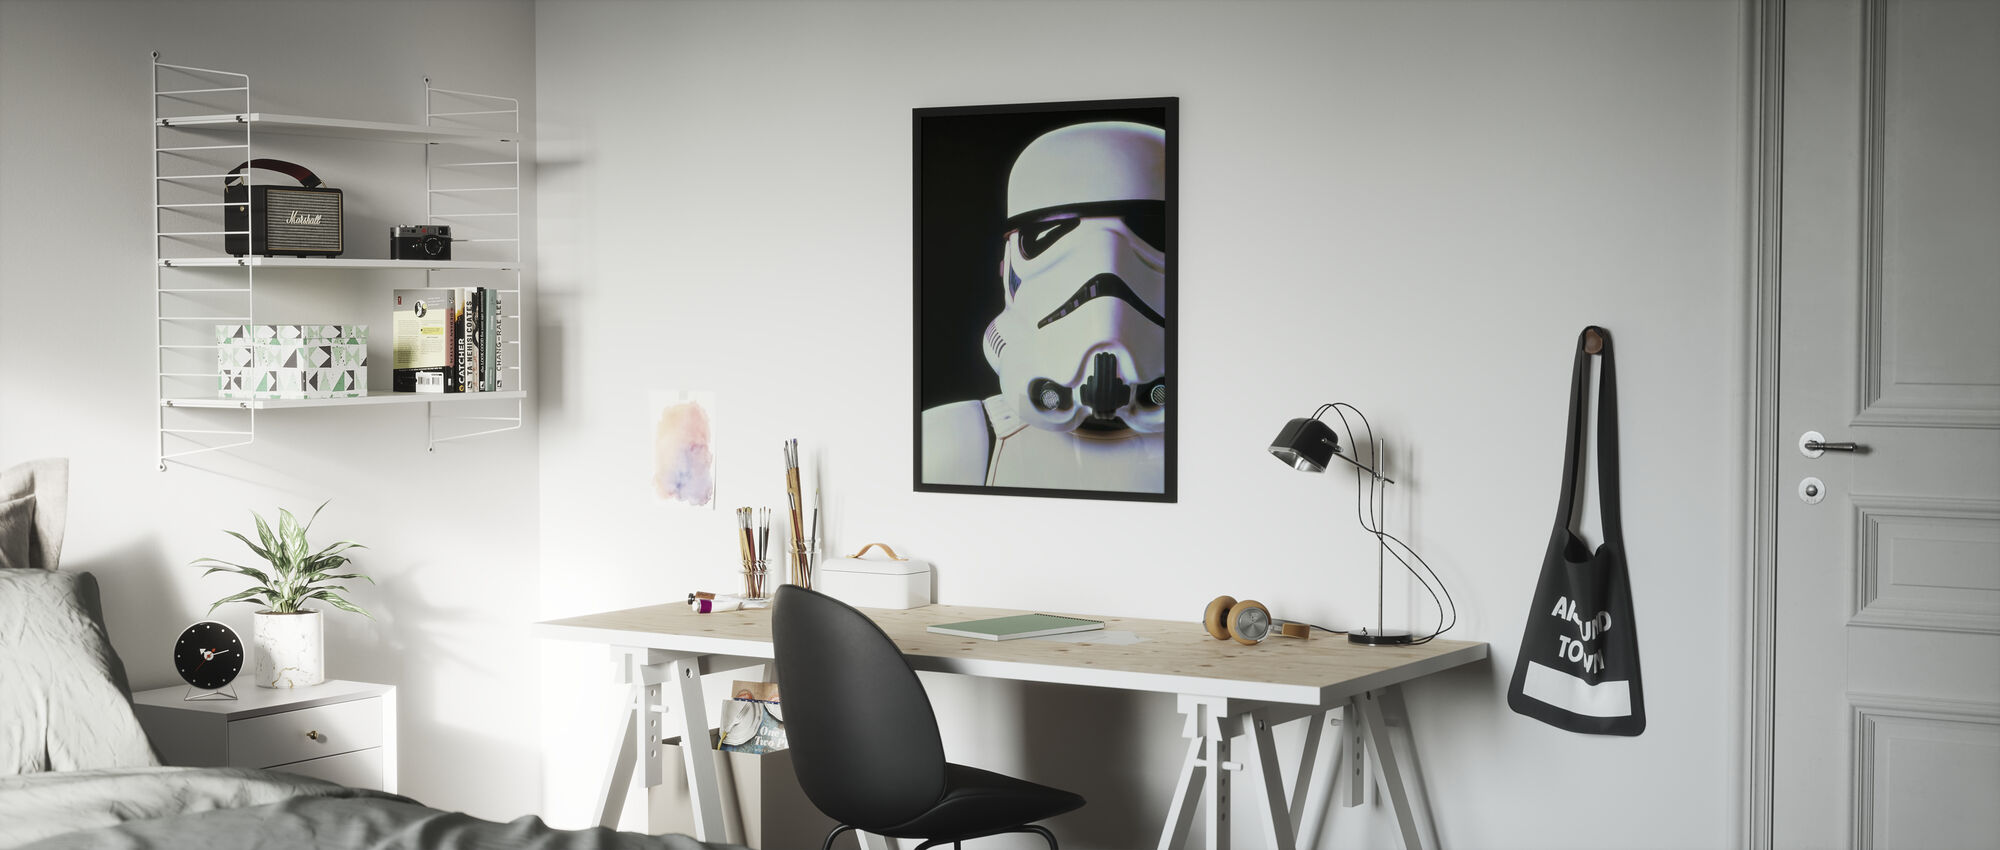 Star Wars - Stormtrooper - Innrammet bilde - Barnerom